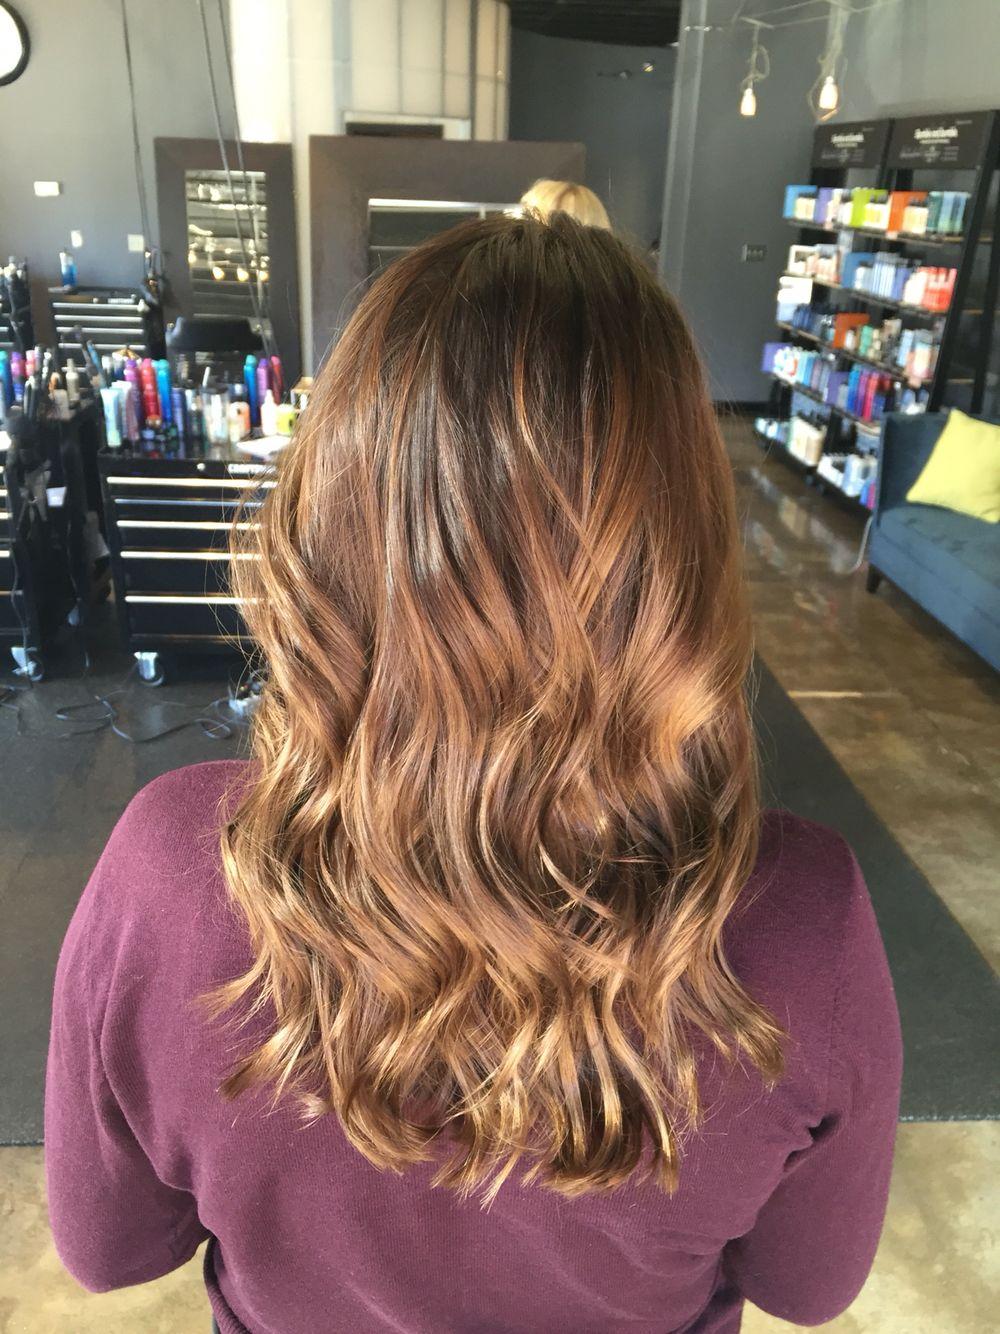 Brown Hair Metropolis Salon Fayetteville Ar